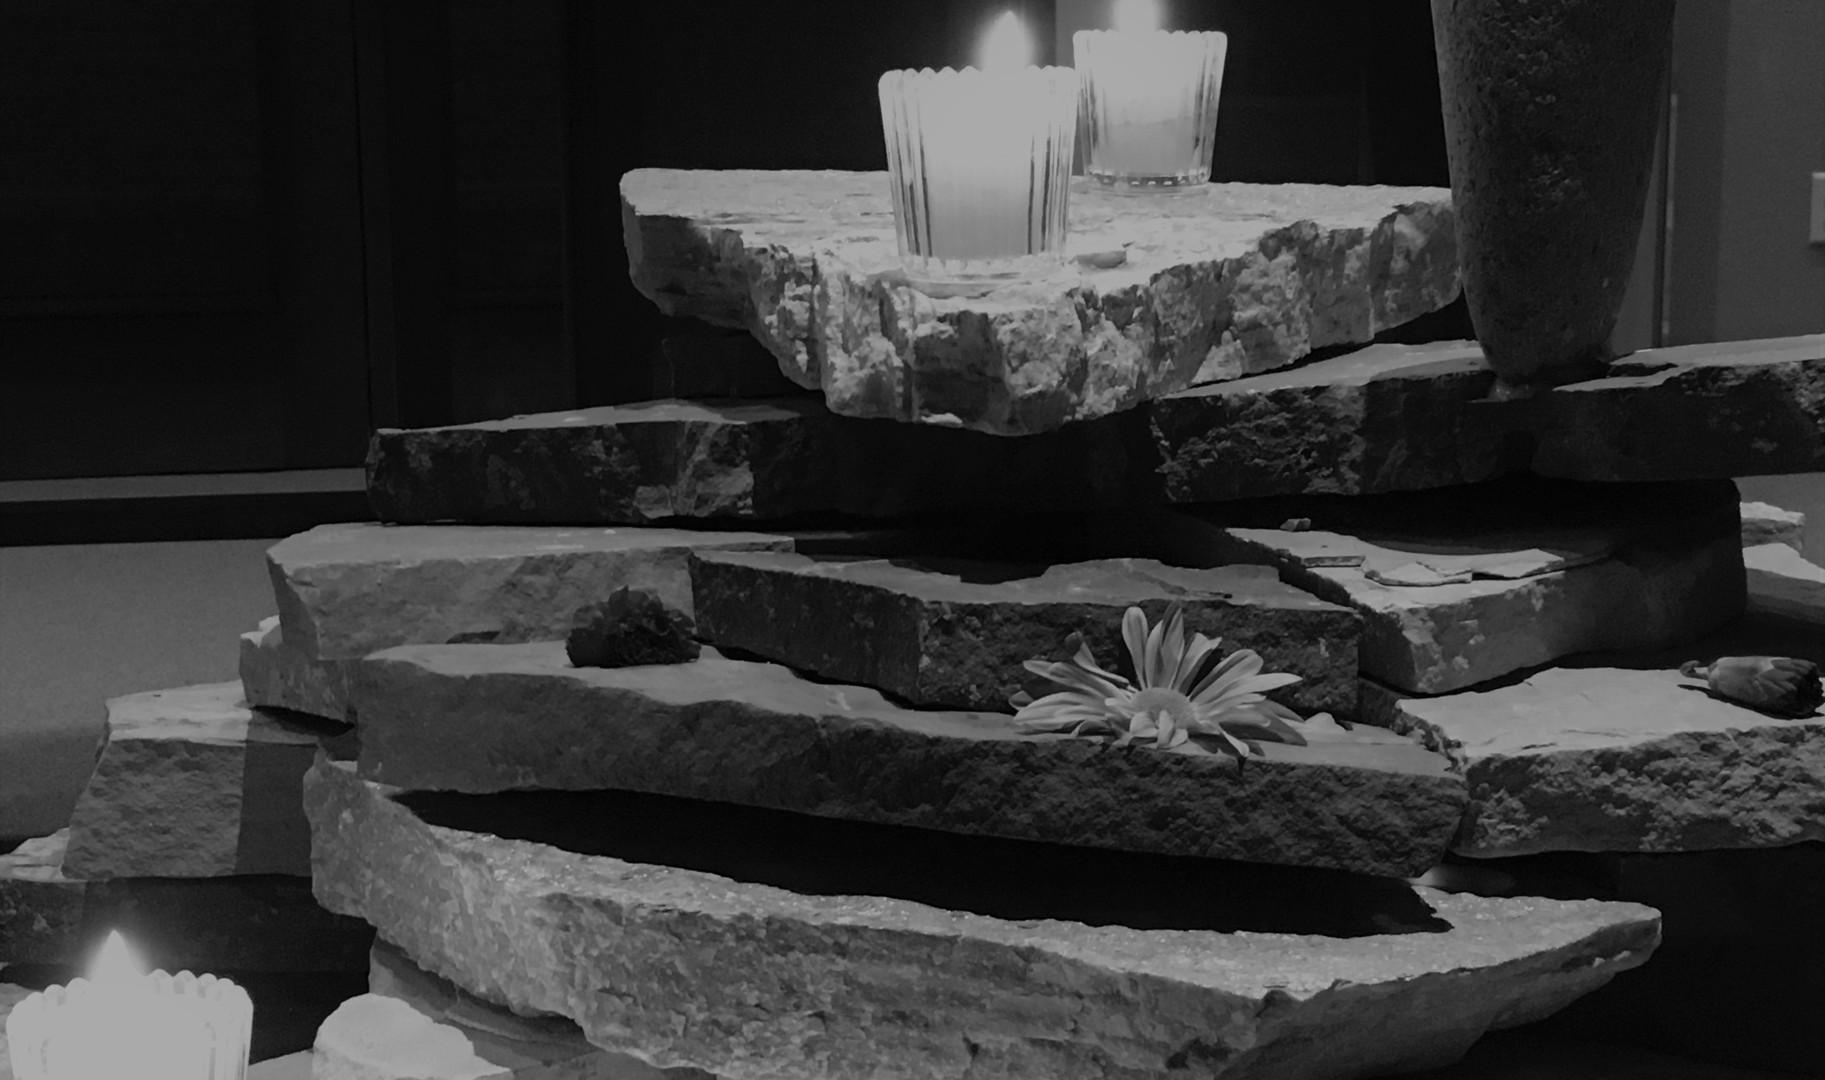 Cairn in Sanctuary